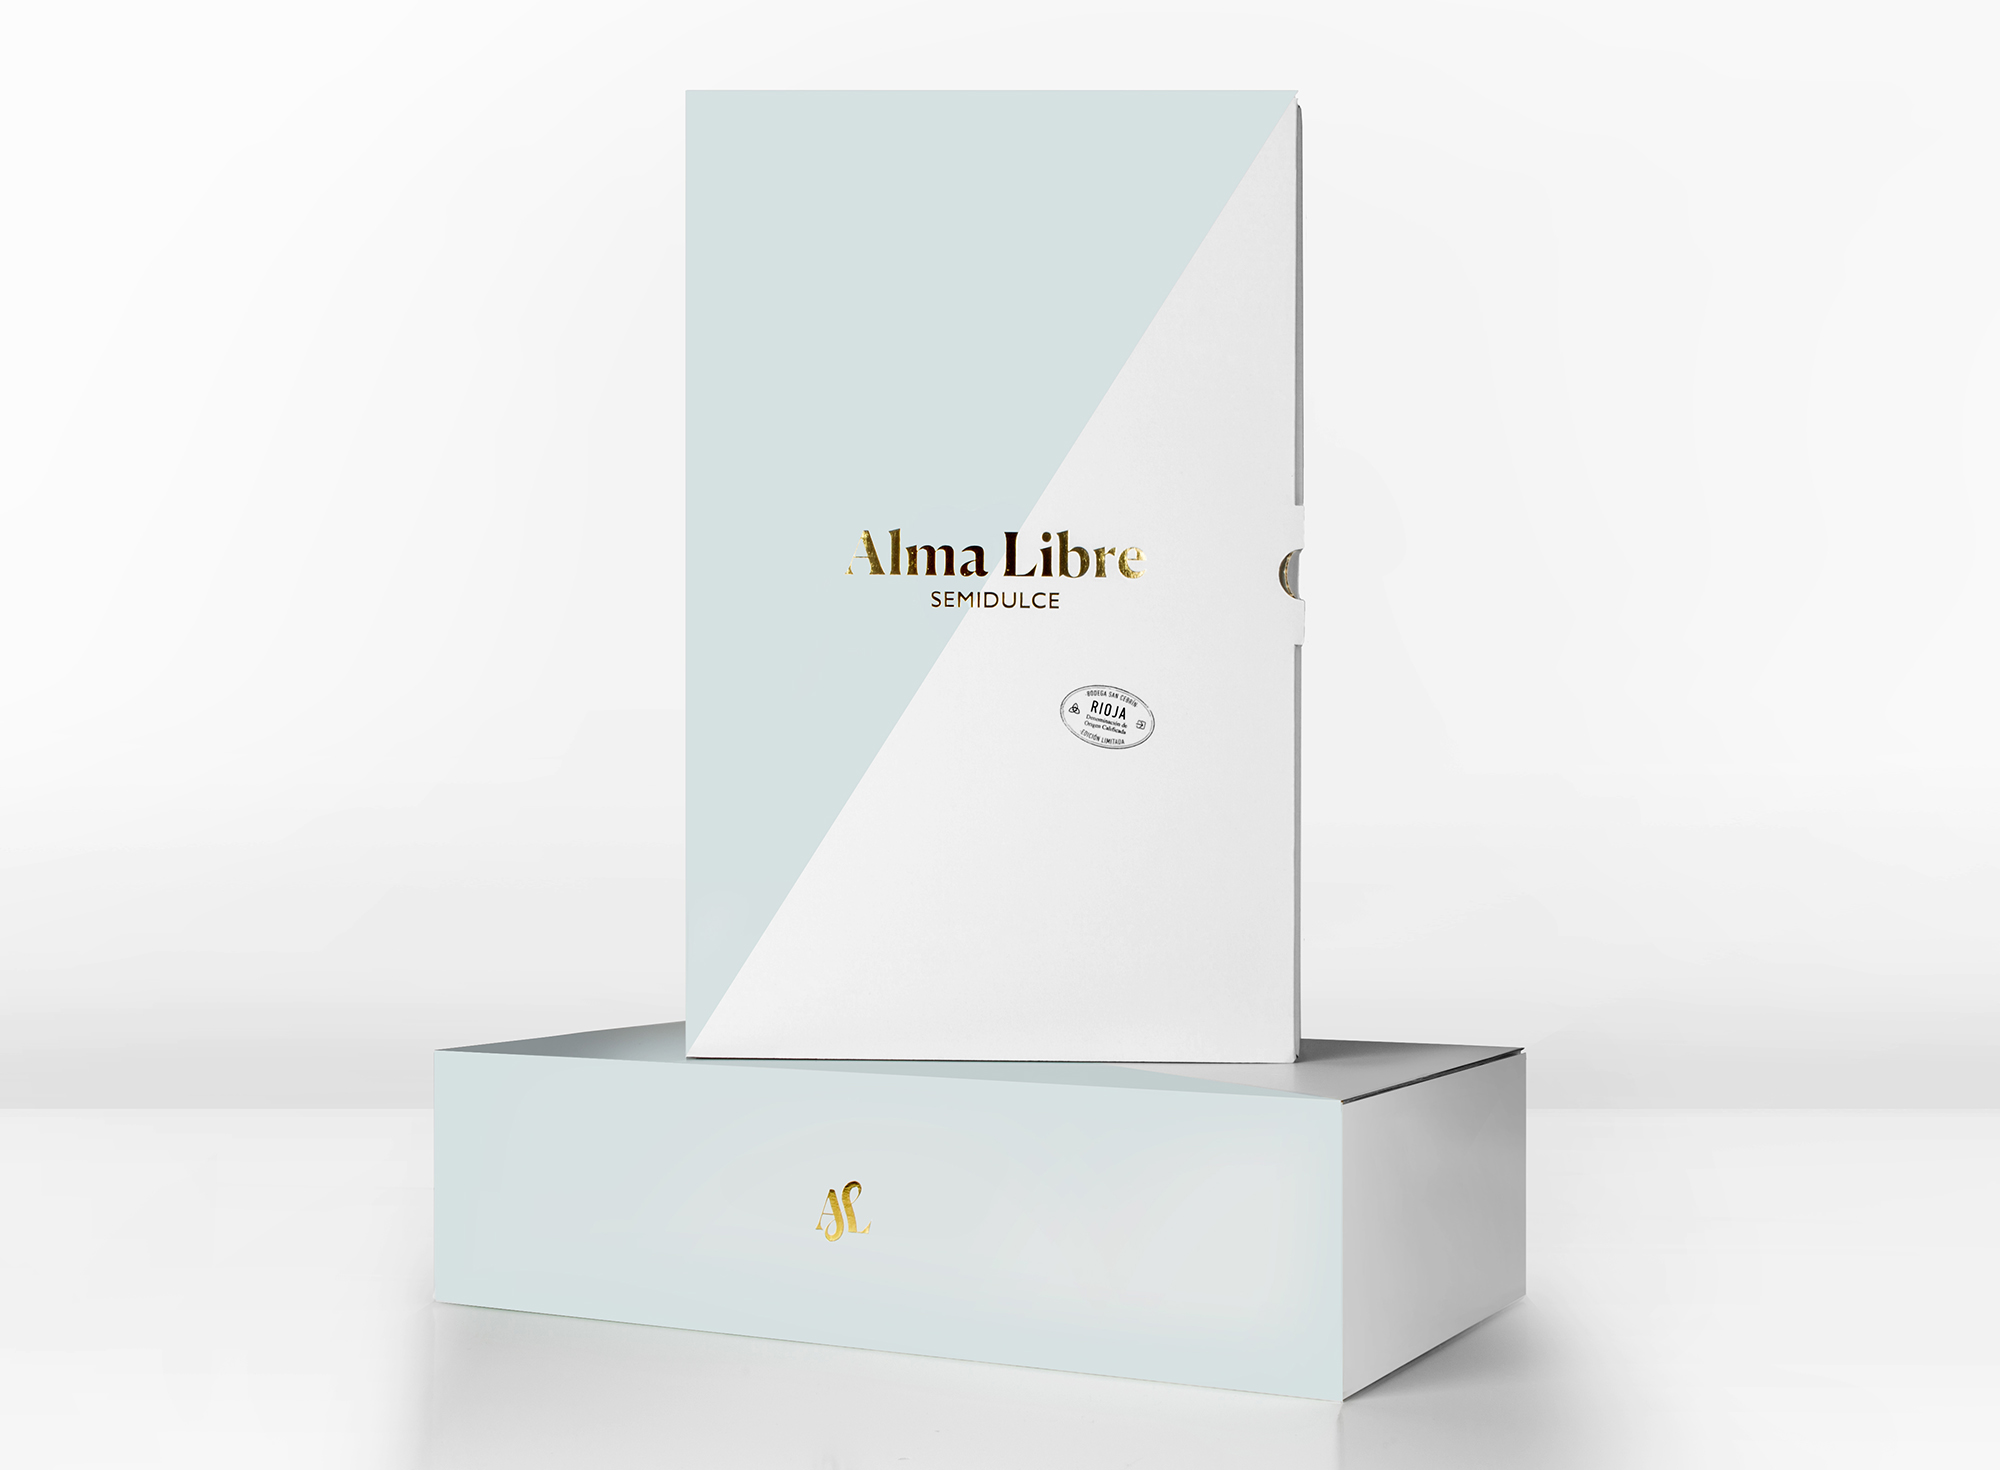 Diseño de packaging de caja vino. Alma libre.